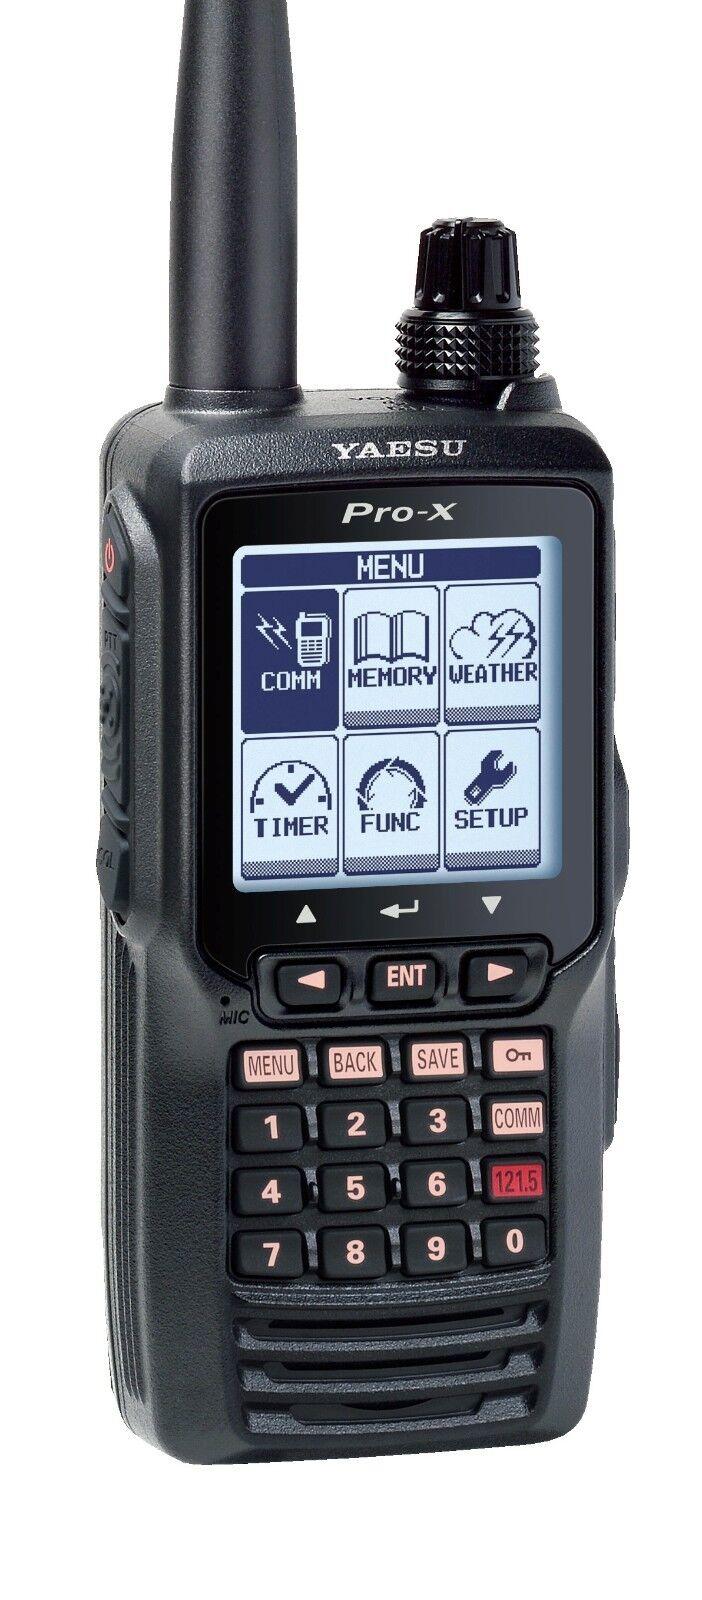 Yaesu FTA-550L VHF NAV/COM Handheld Radio w/ Li-Ion Battery Authorized Dealer